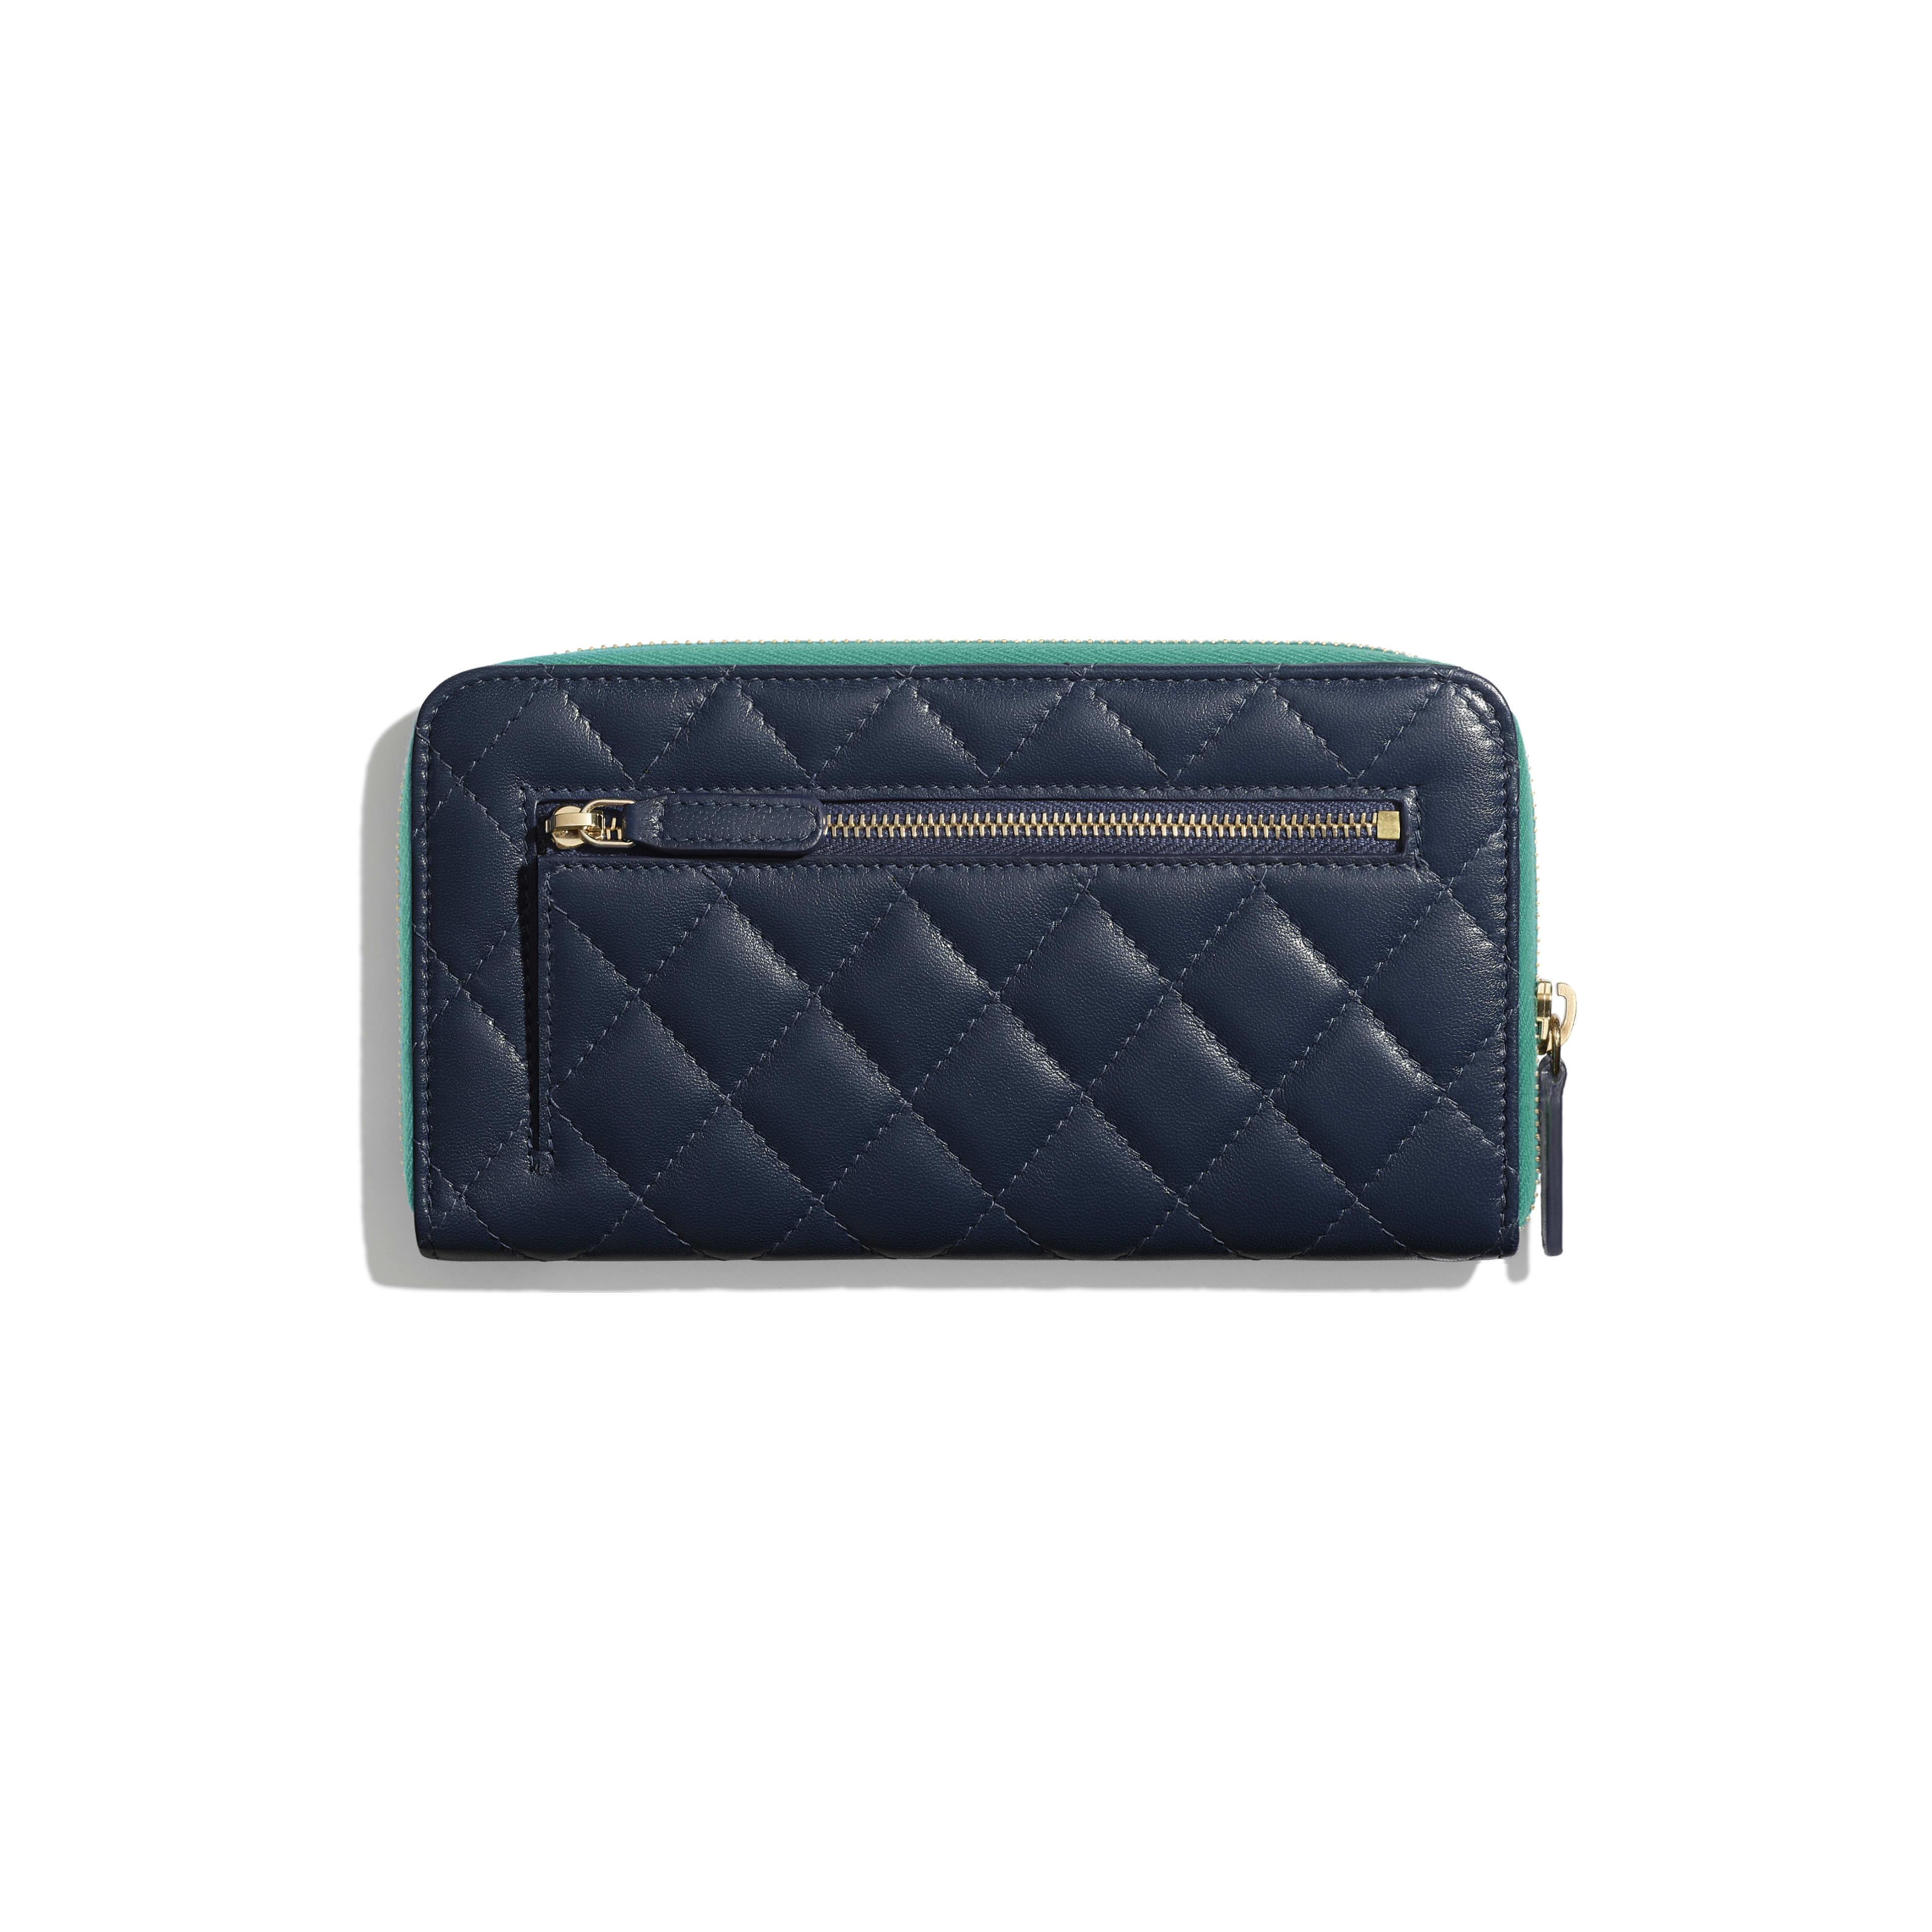 Long Zipped Wallet - Navy Blue, Green & Dark Pink - Goatskin & Gold-Tone Metal - Alternative view - see full sized version